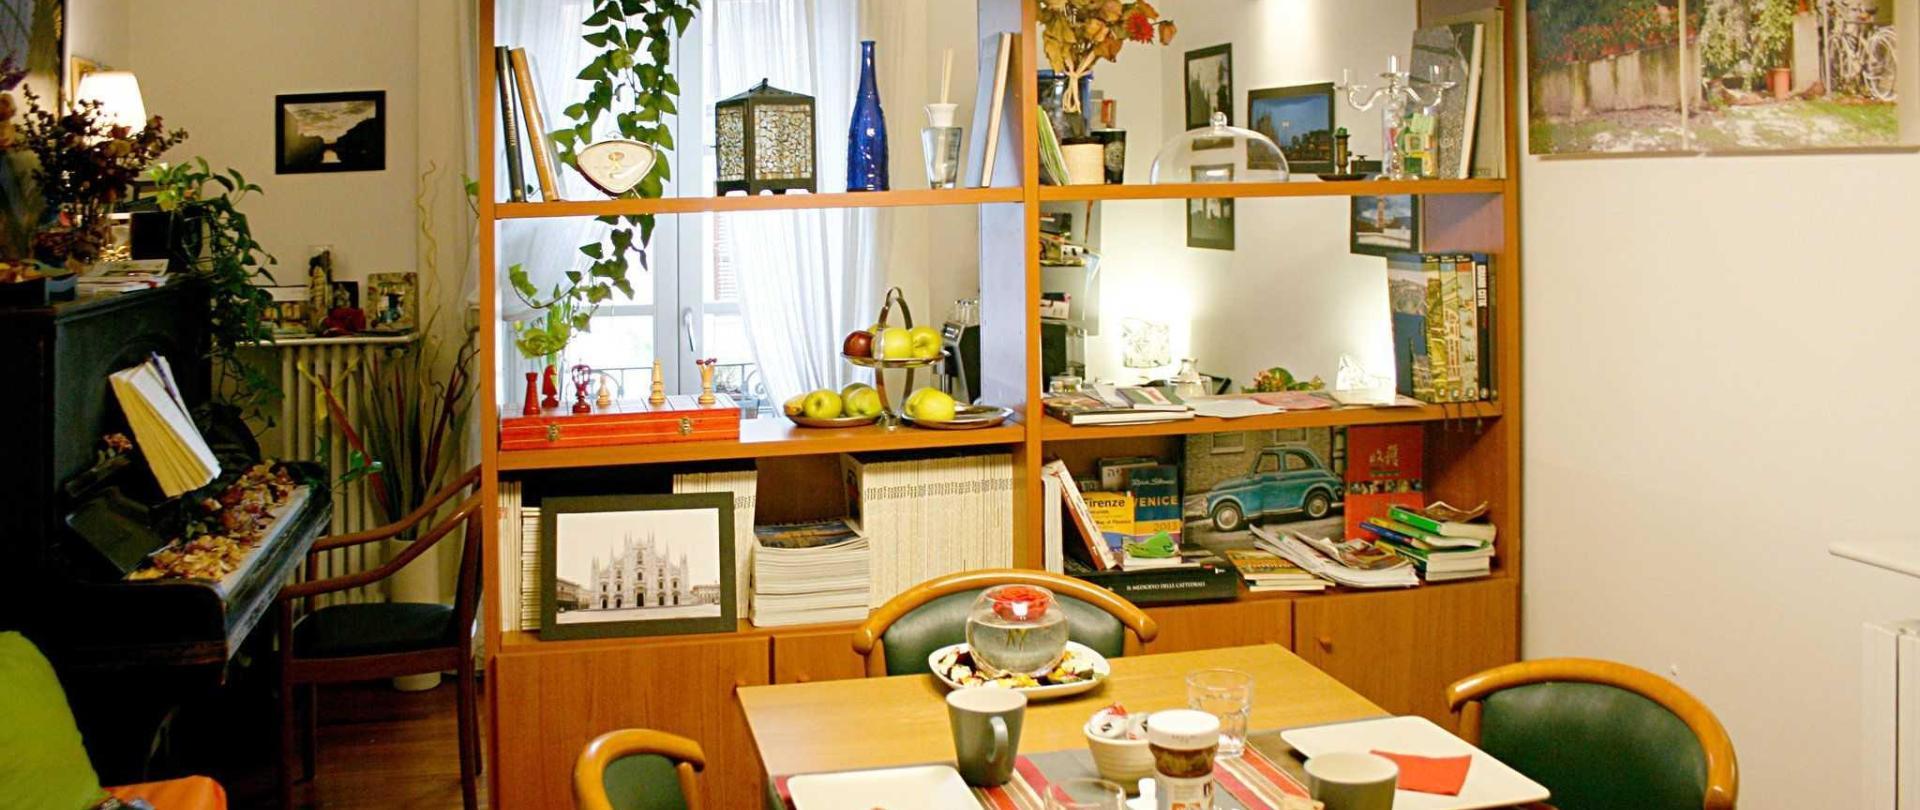 breakfastroom-3.jpg